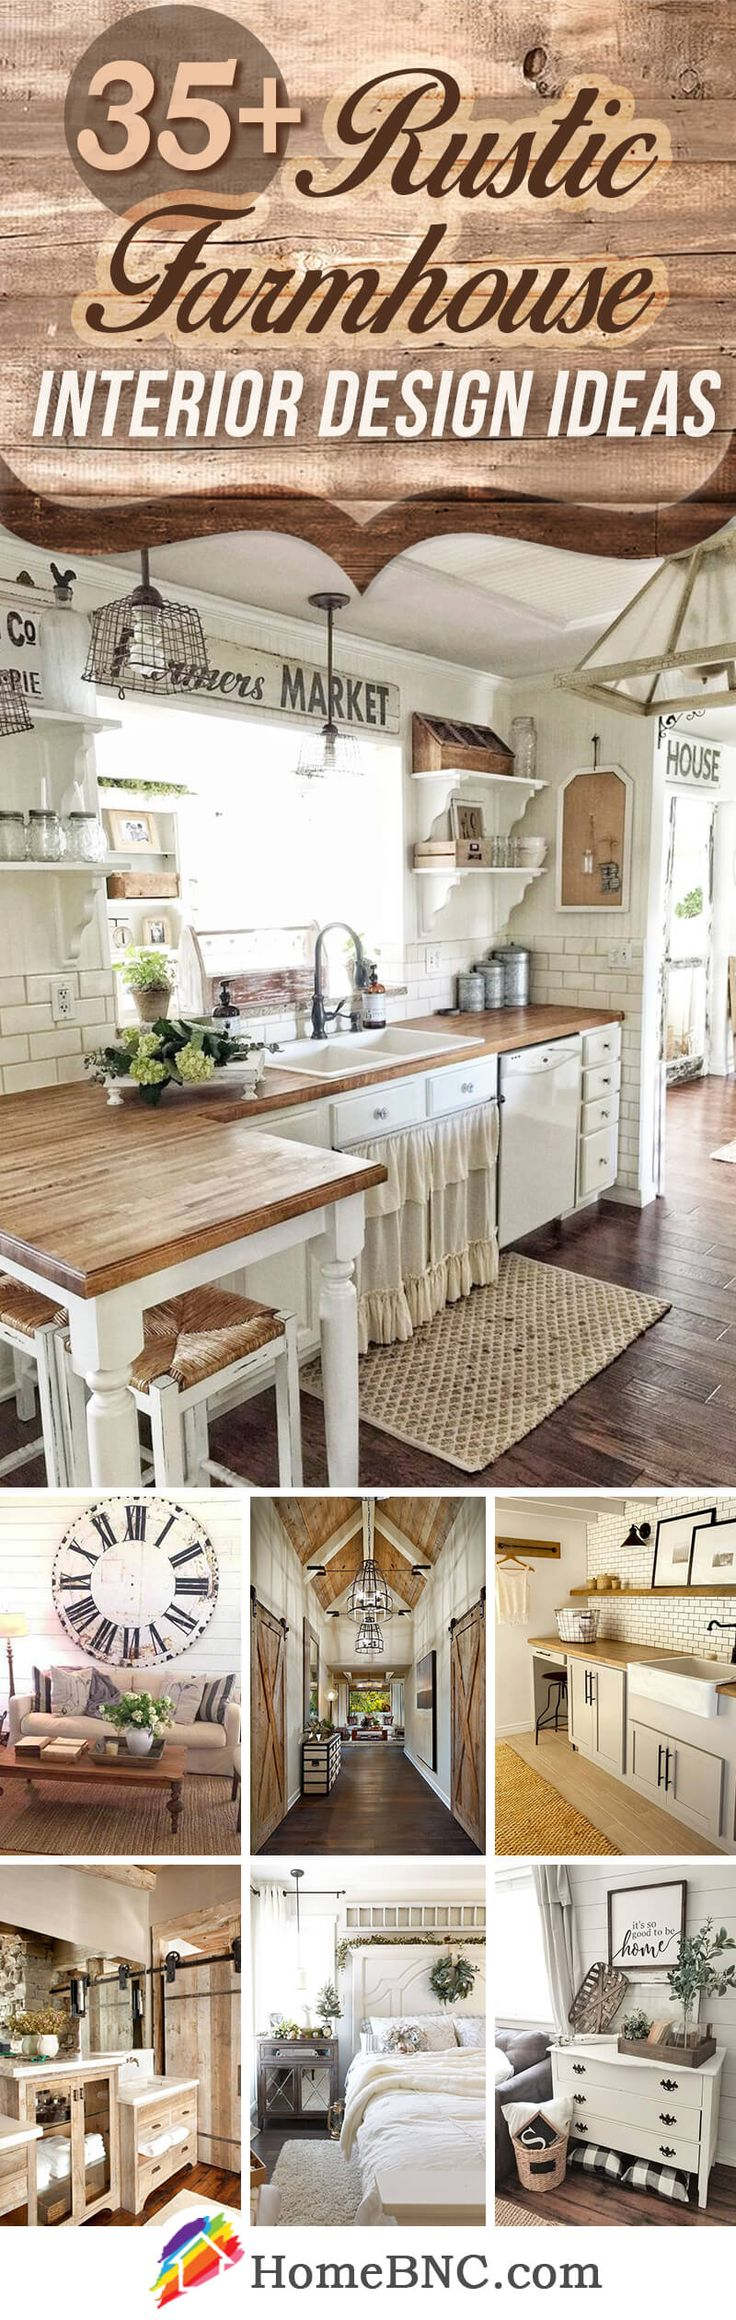 Rustic Farmhouse Interior Design Ideas